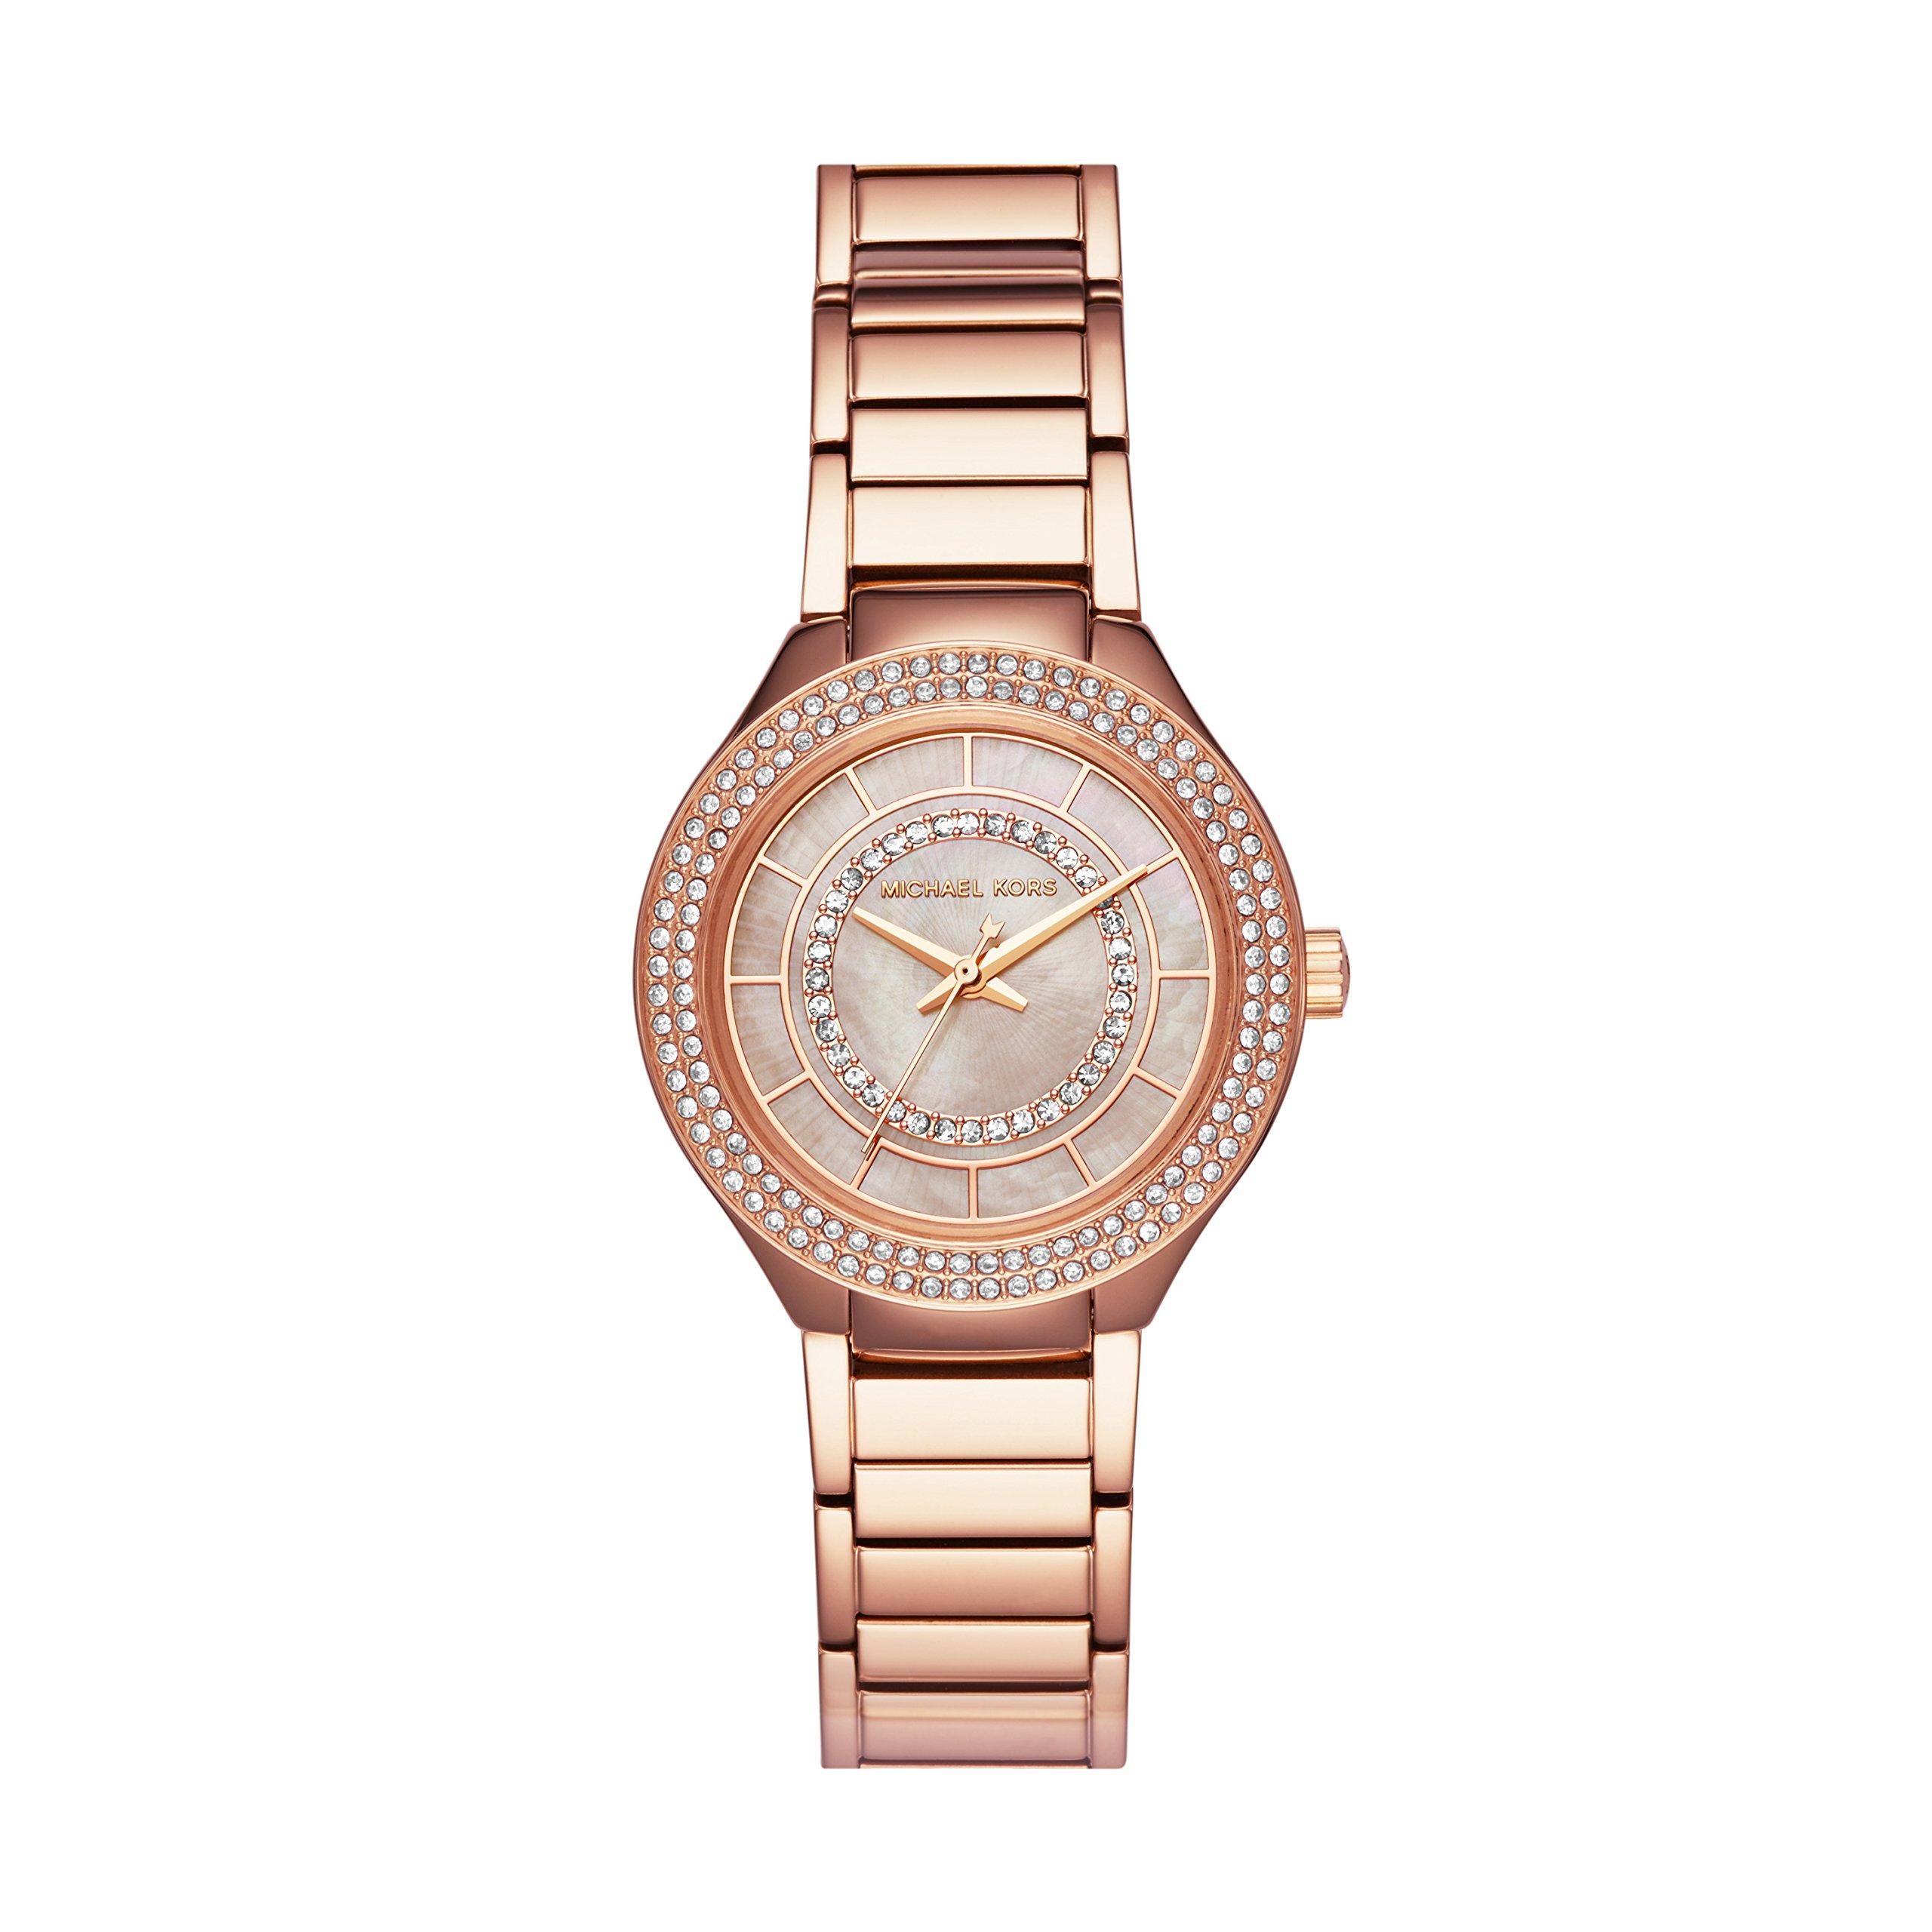 Michael Kors Women's 'Mini Kerry' Quartz Stainless Steel Casual Watch, Color:Rose Gold-Toned (Model: MK3802)